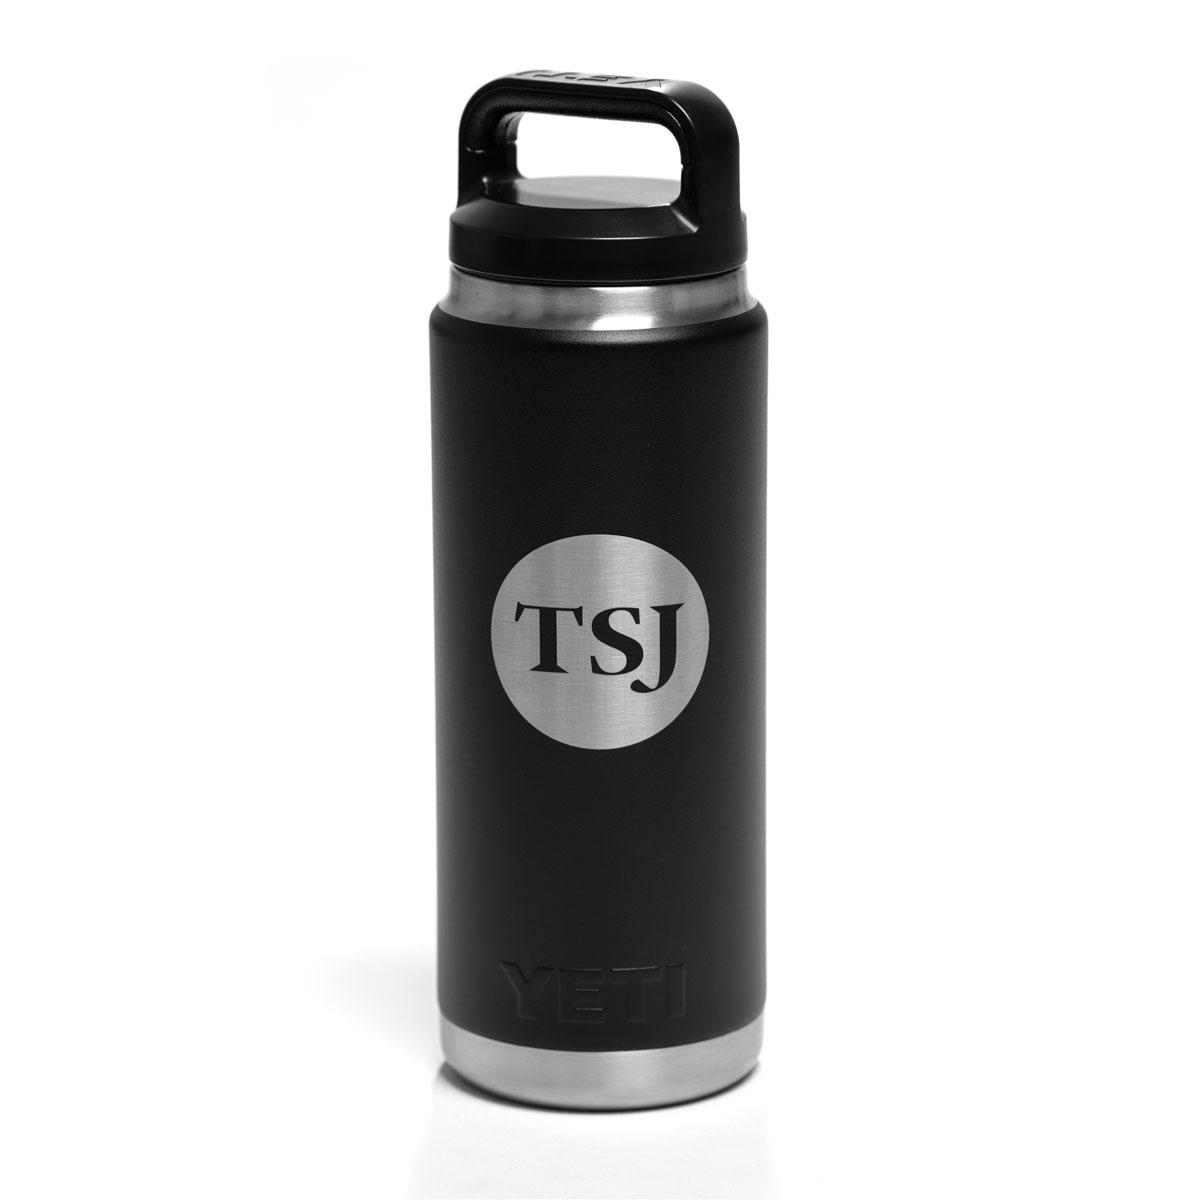 TSJ x YETI Rambler Bottle 26oz